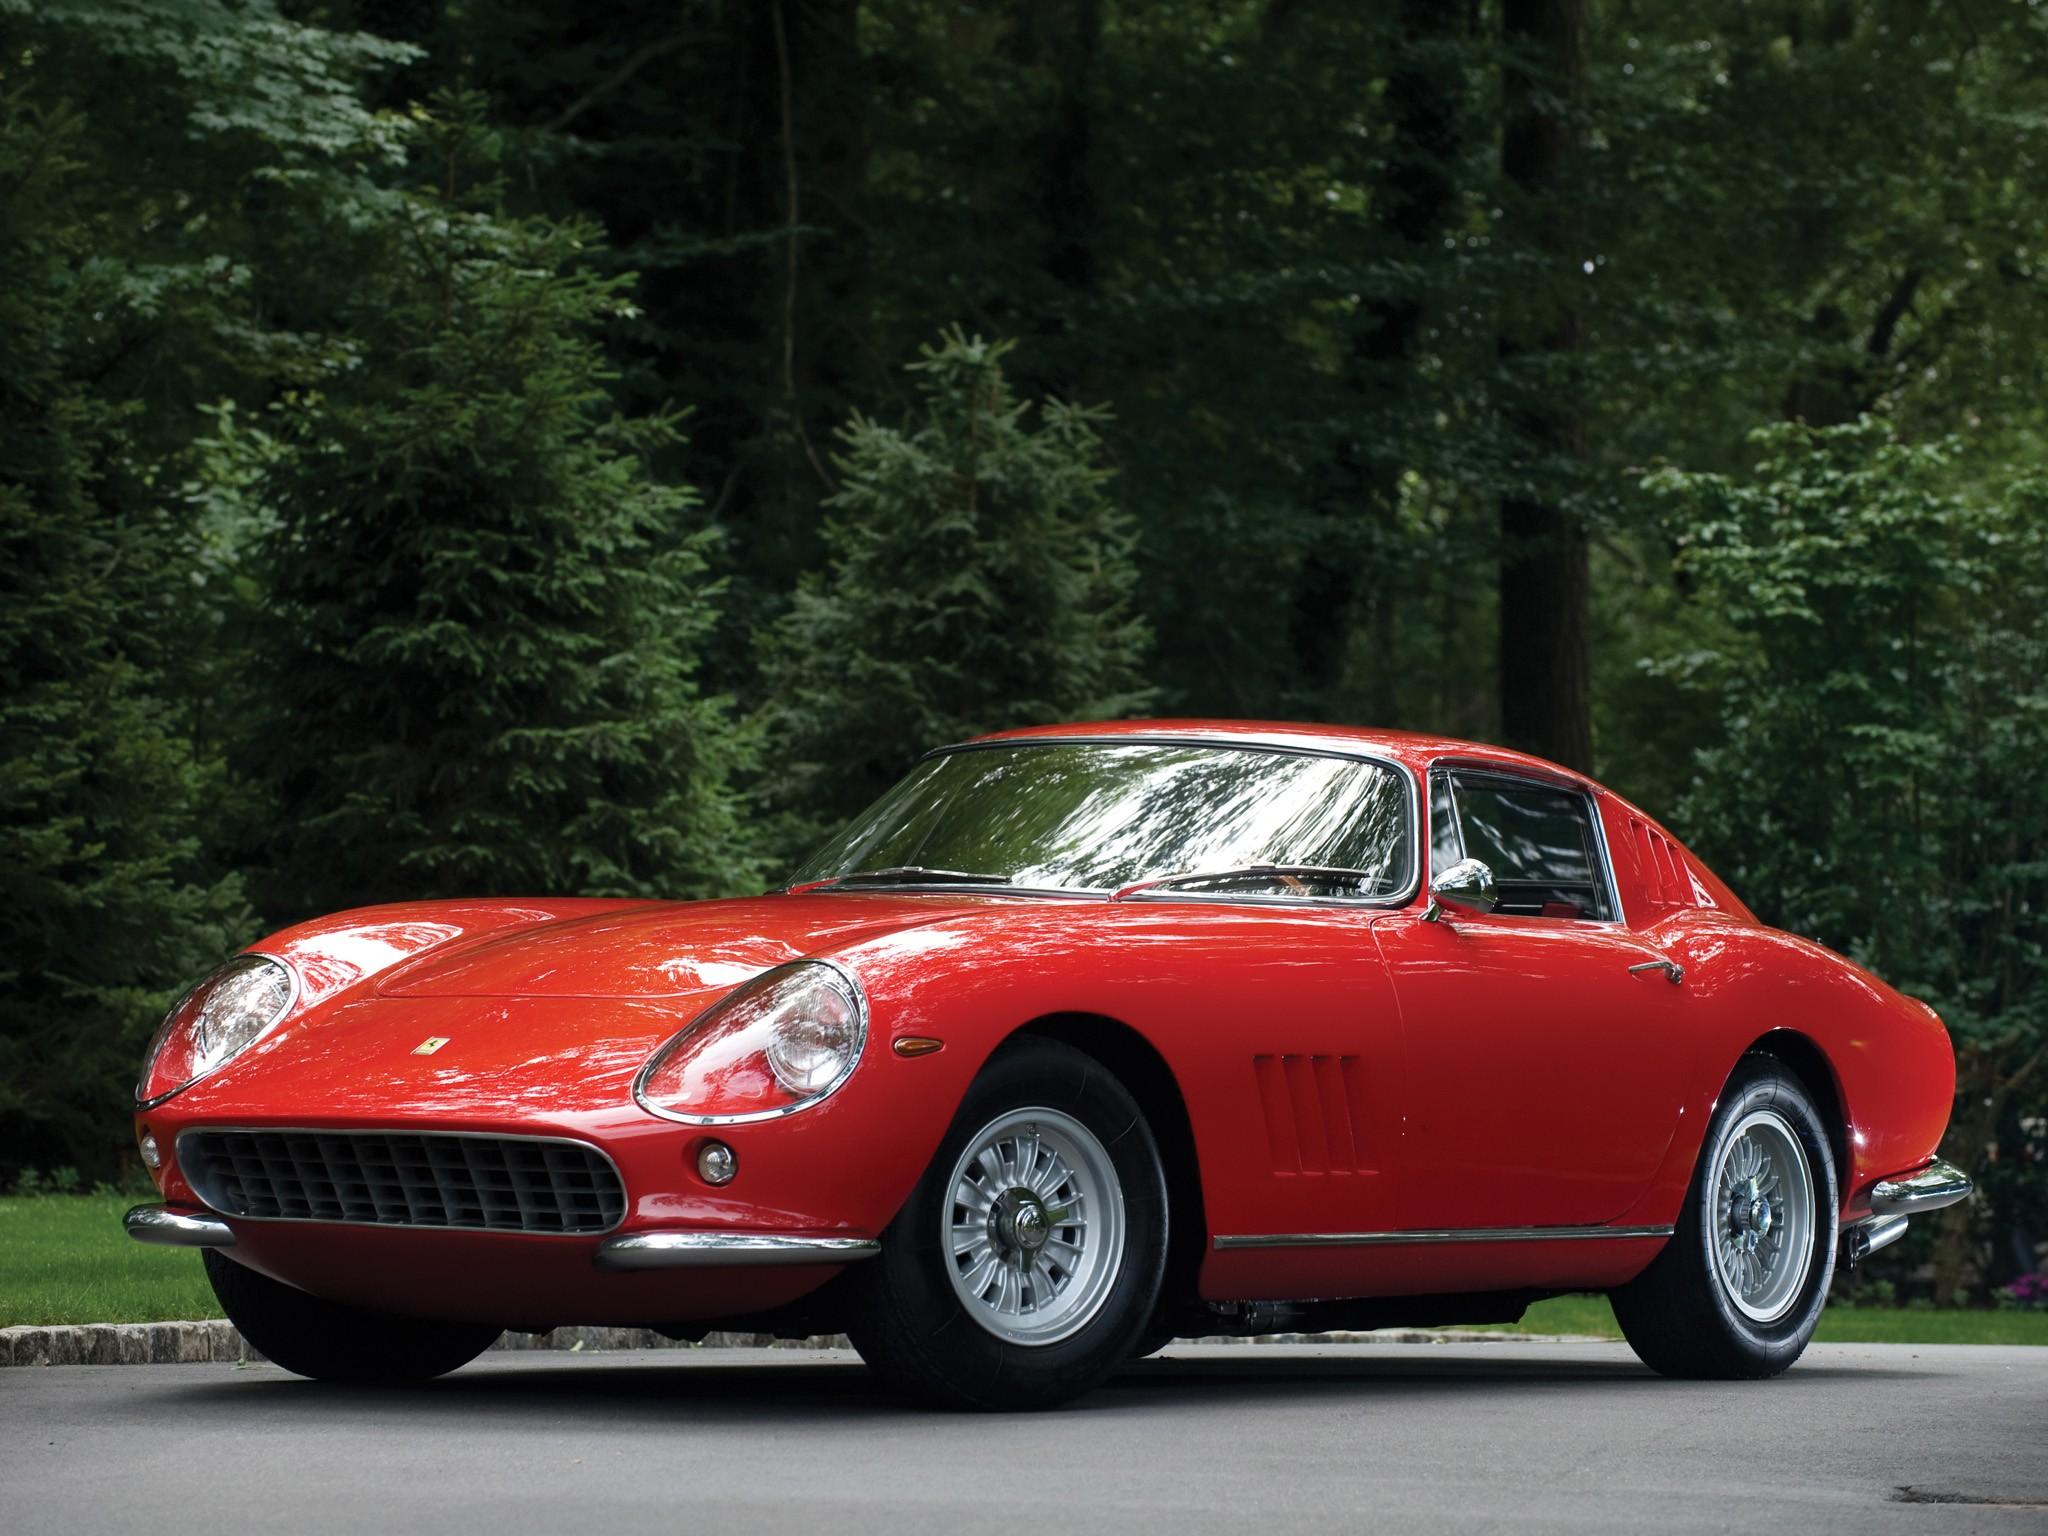 Ferrari 275 Gtb Specs 1964 1965 1966 1967 1968